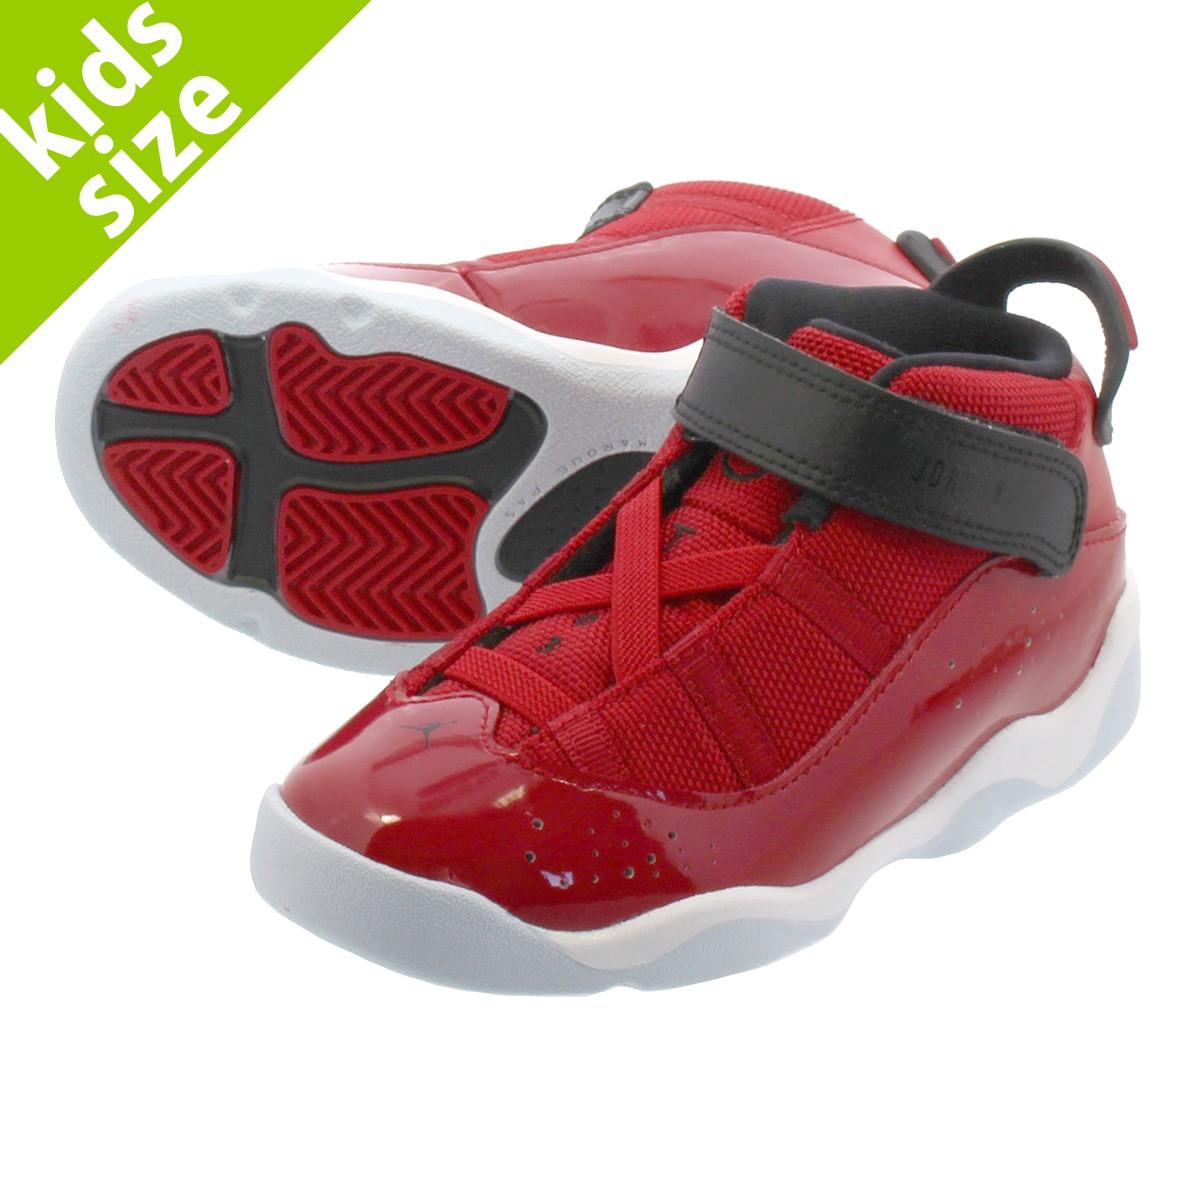 70e264f9c85 LOWTEX PLUS: NIKE JORDAN 6 RINGS TD Nike Jordan 6 RINGS Co.,Ltd. TD GYM  RED/BLACK/WHITE 323,420-601 | Rakuten Global Market